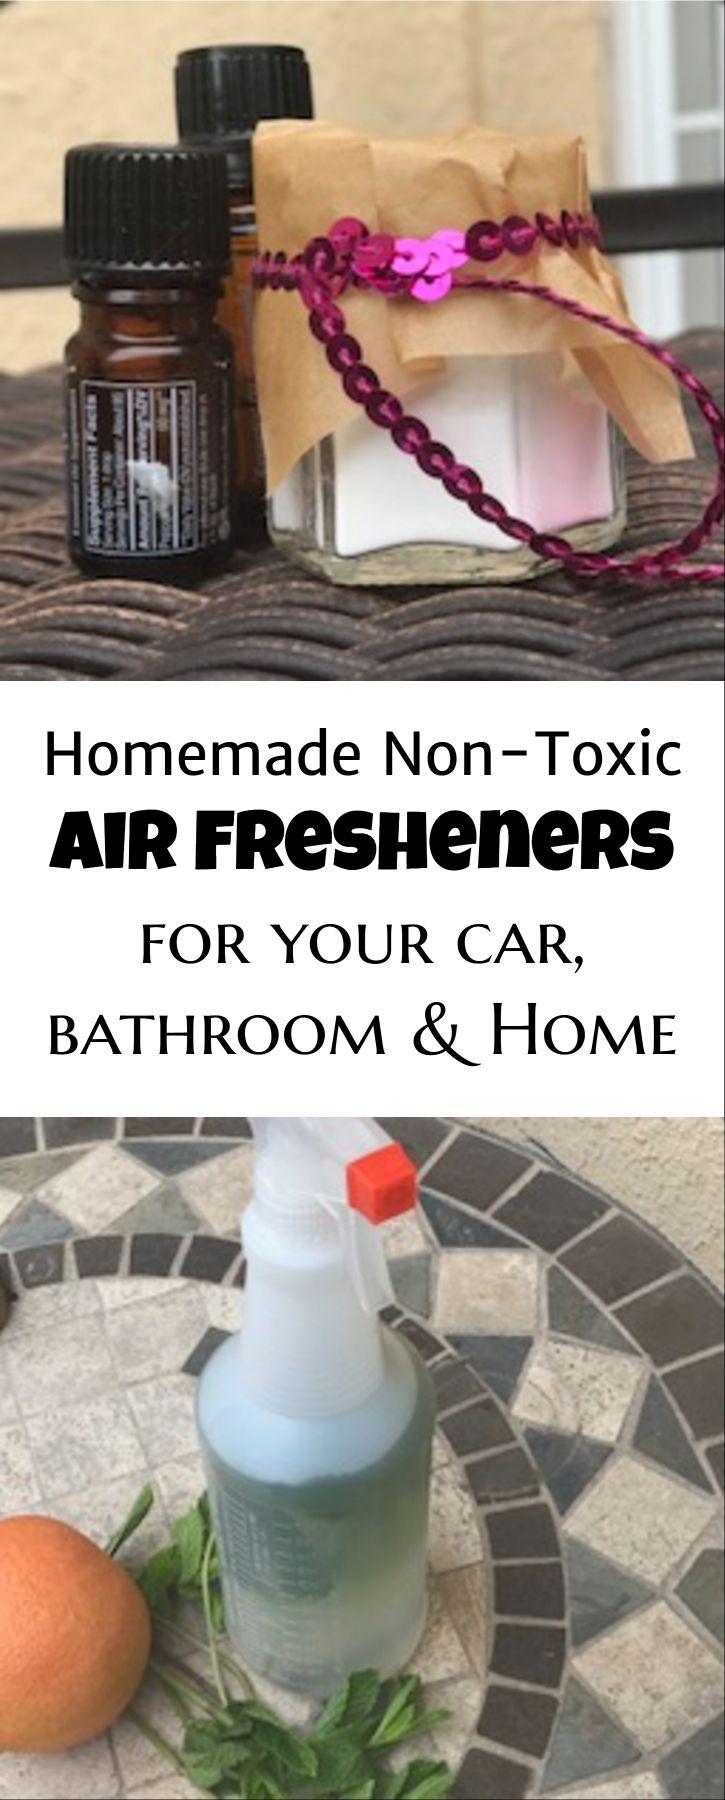 2 Homemade NonToxic Air Fresheners for Bathroom & Car